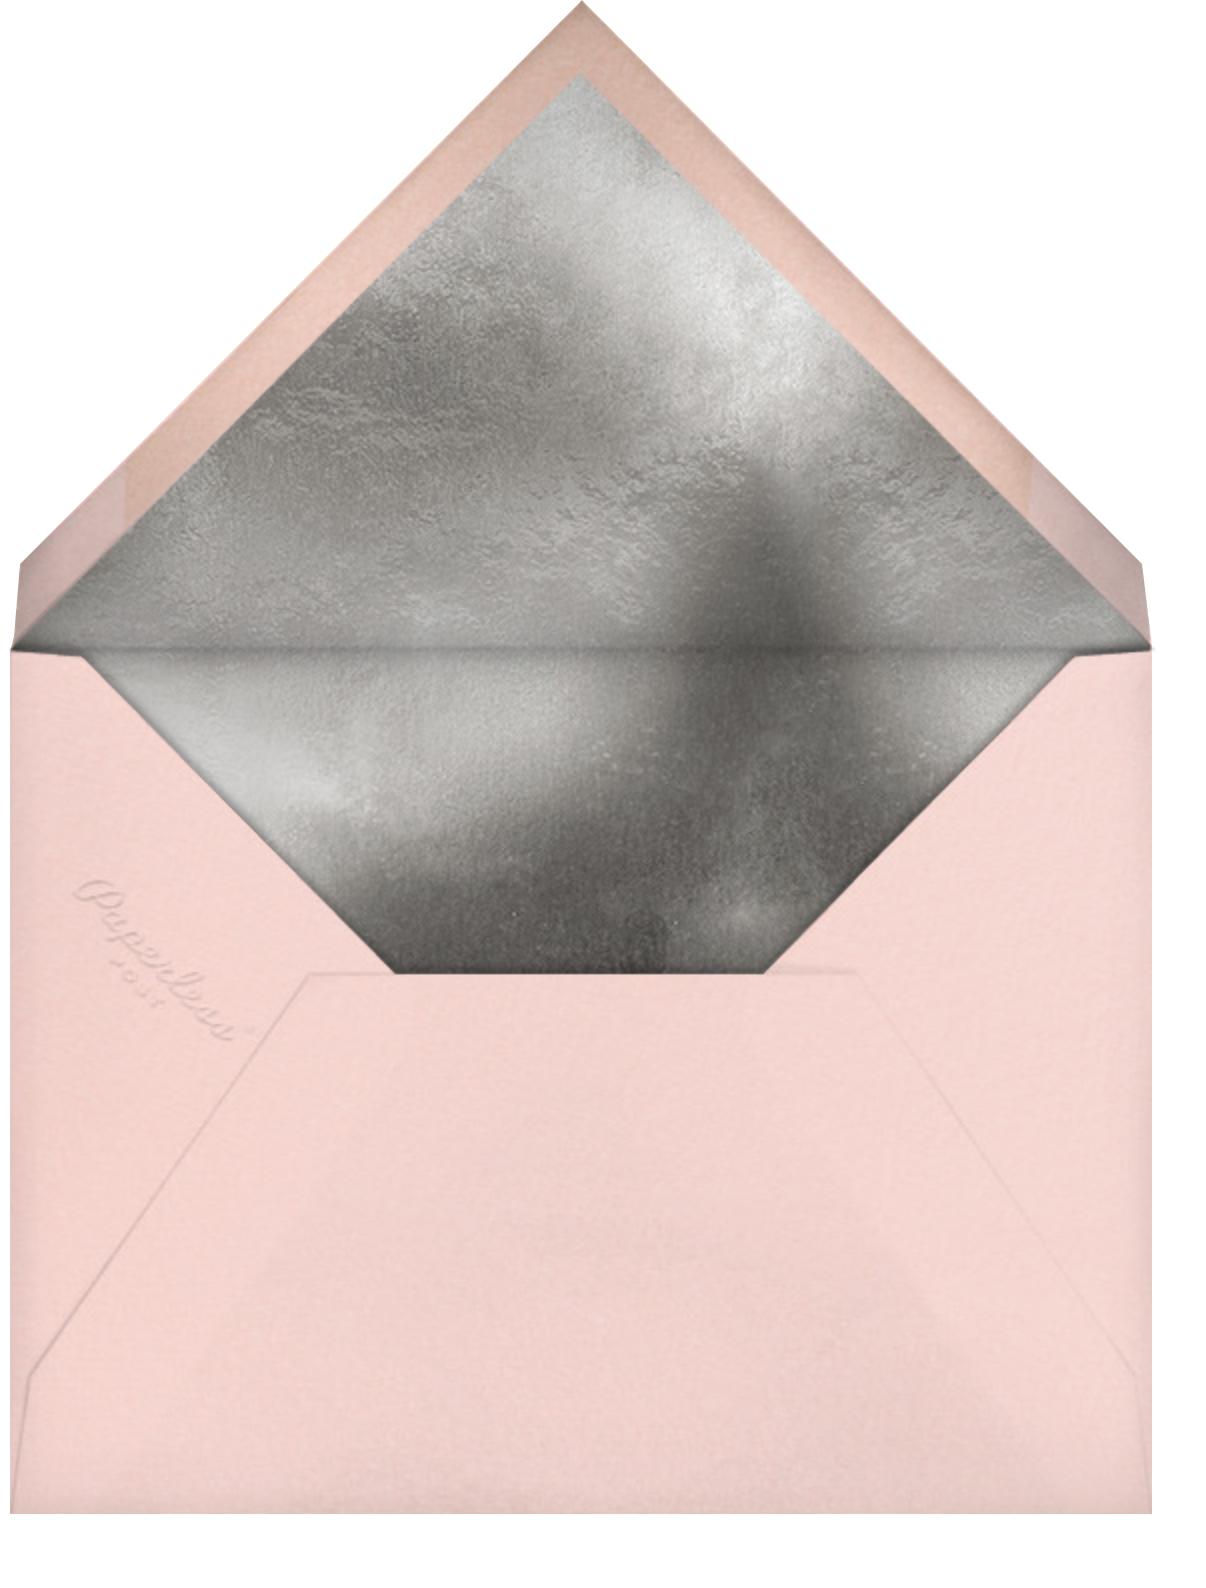 Grace and Gratitude (Merci) - Rose Gold - Paperless Post - Envelope